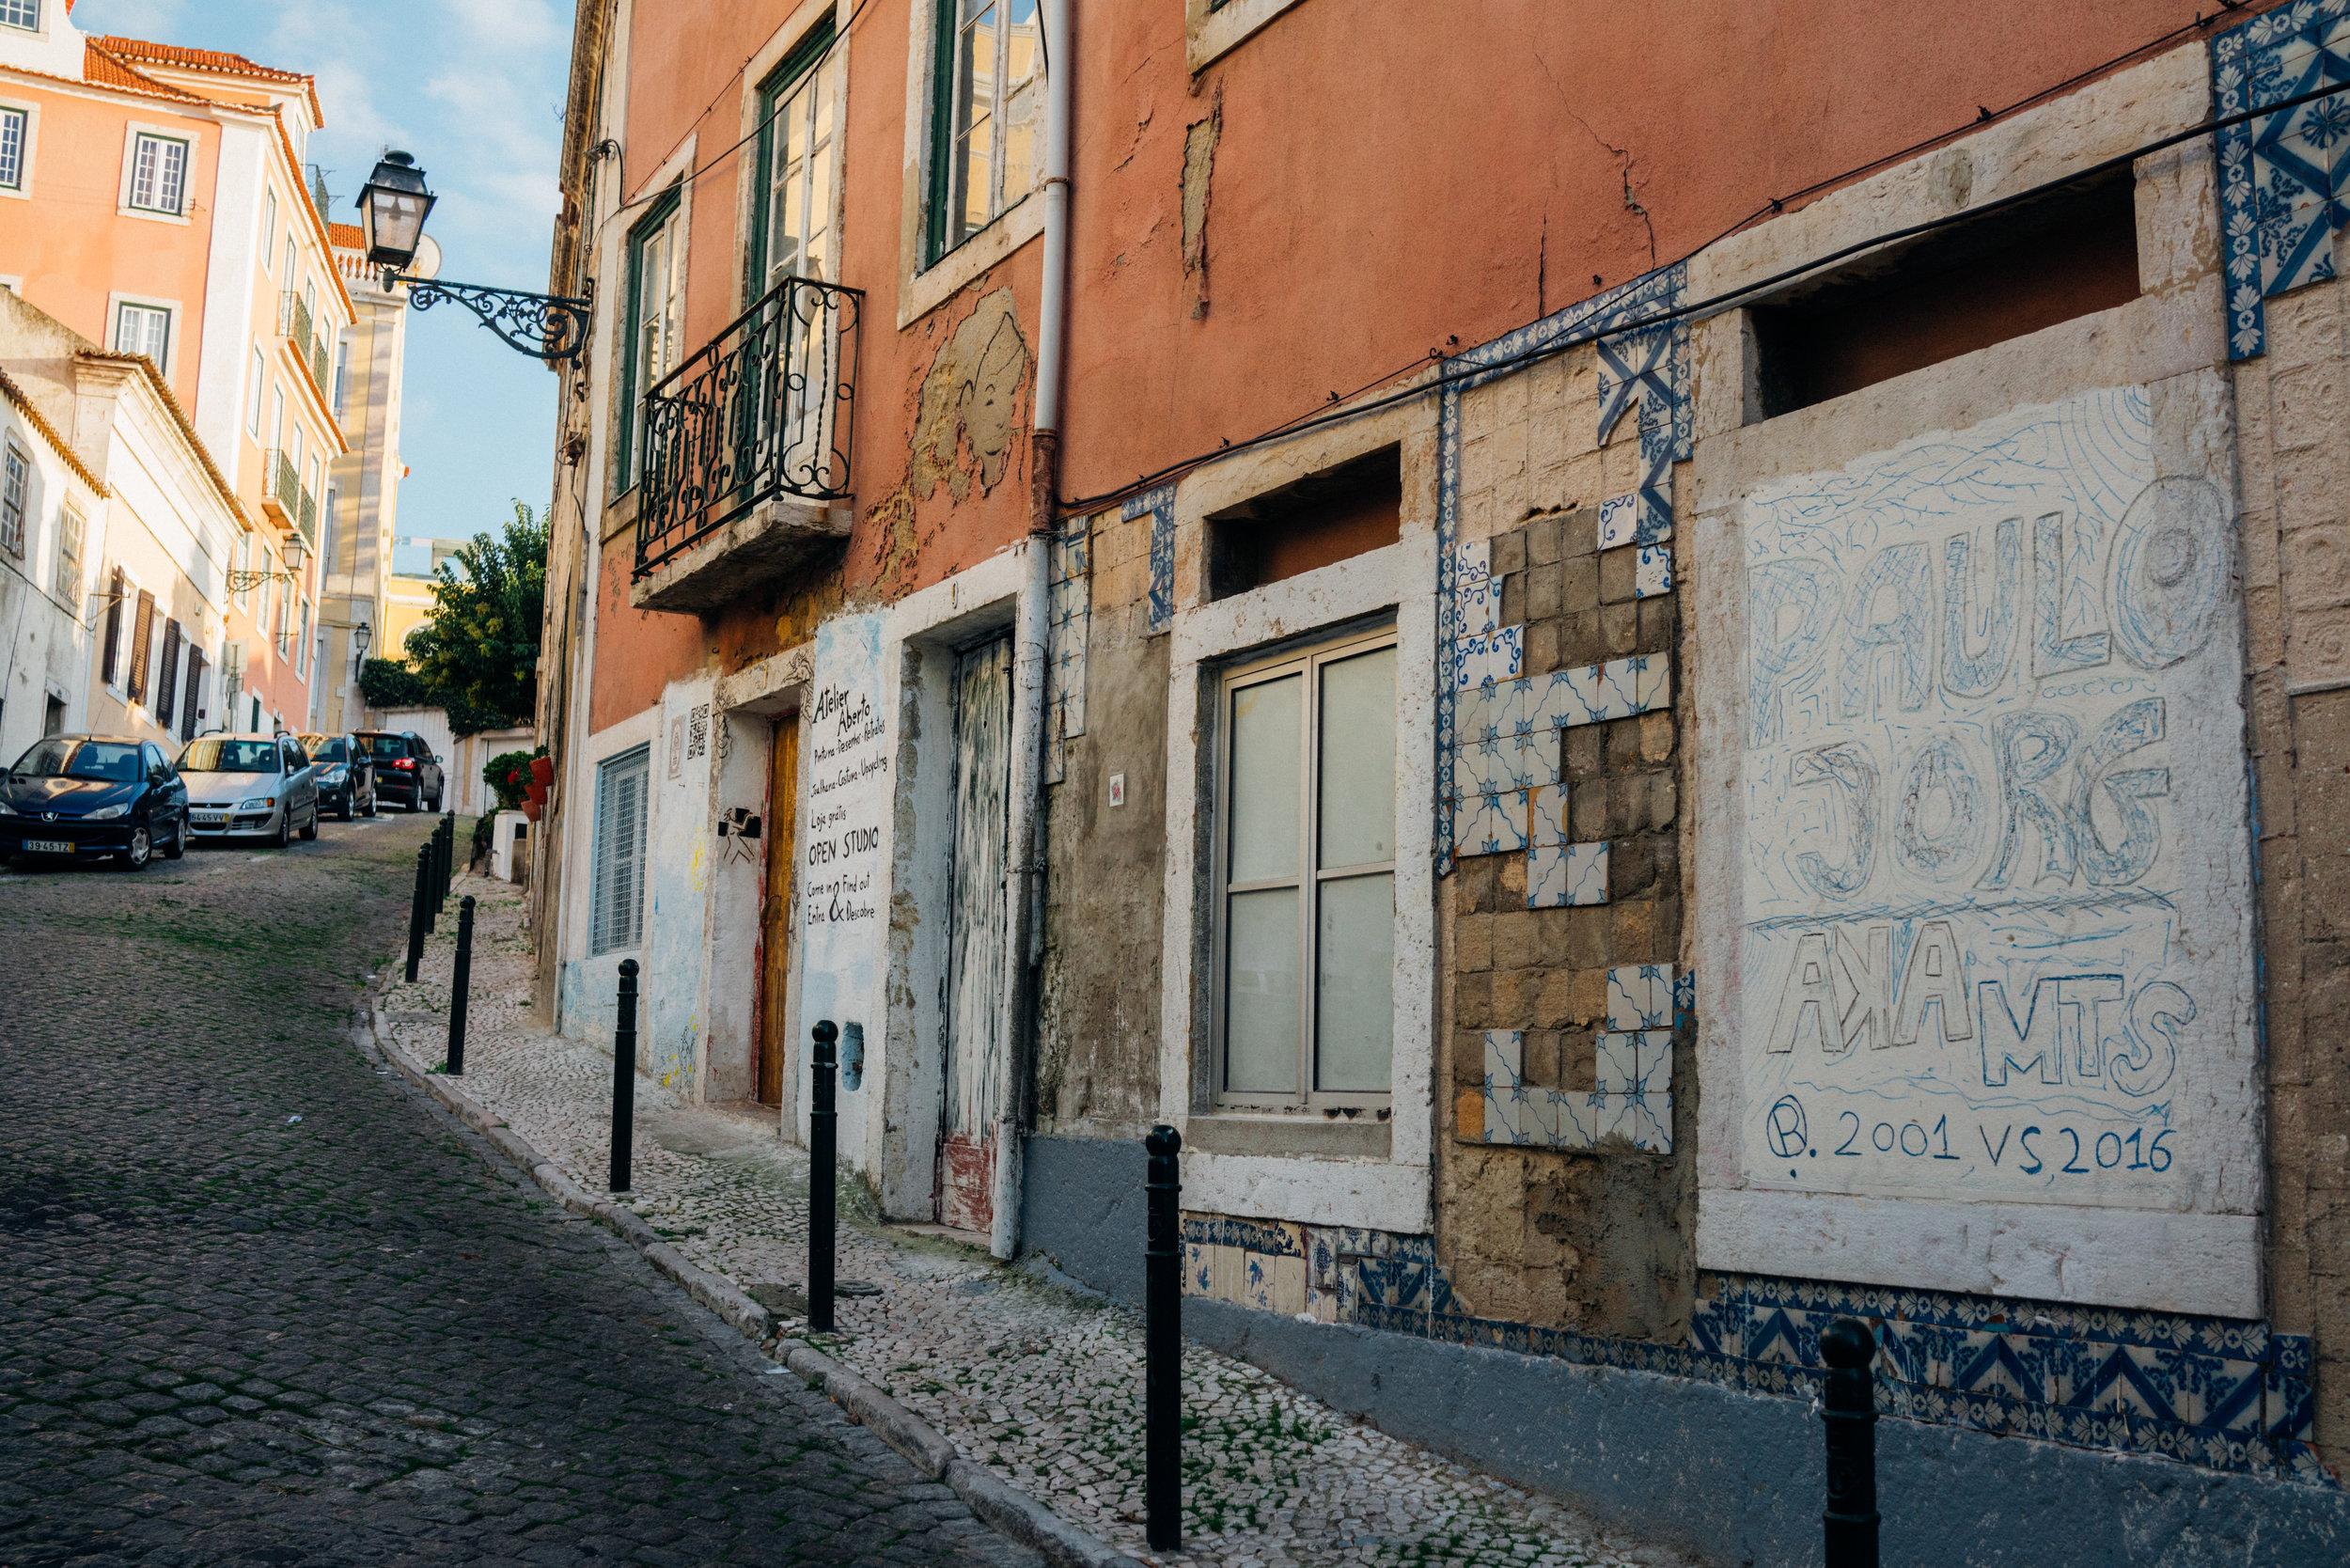 Copenhagen Coffee Lab located on a quiet street in Lisbon's Príncipe Real neighborhood